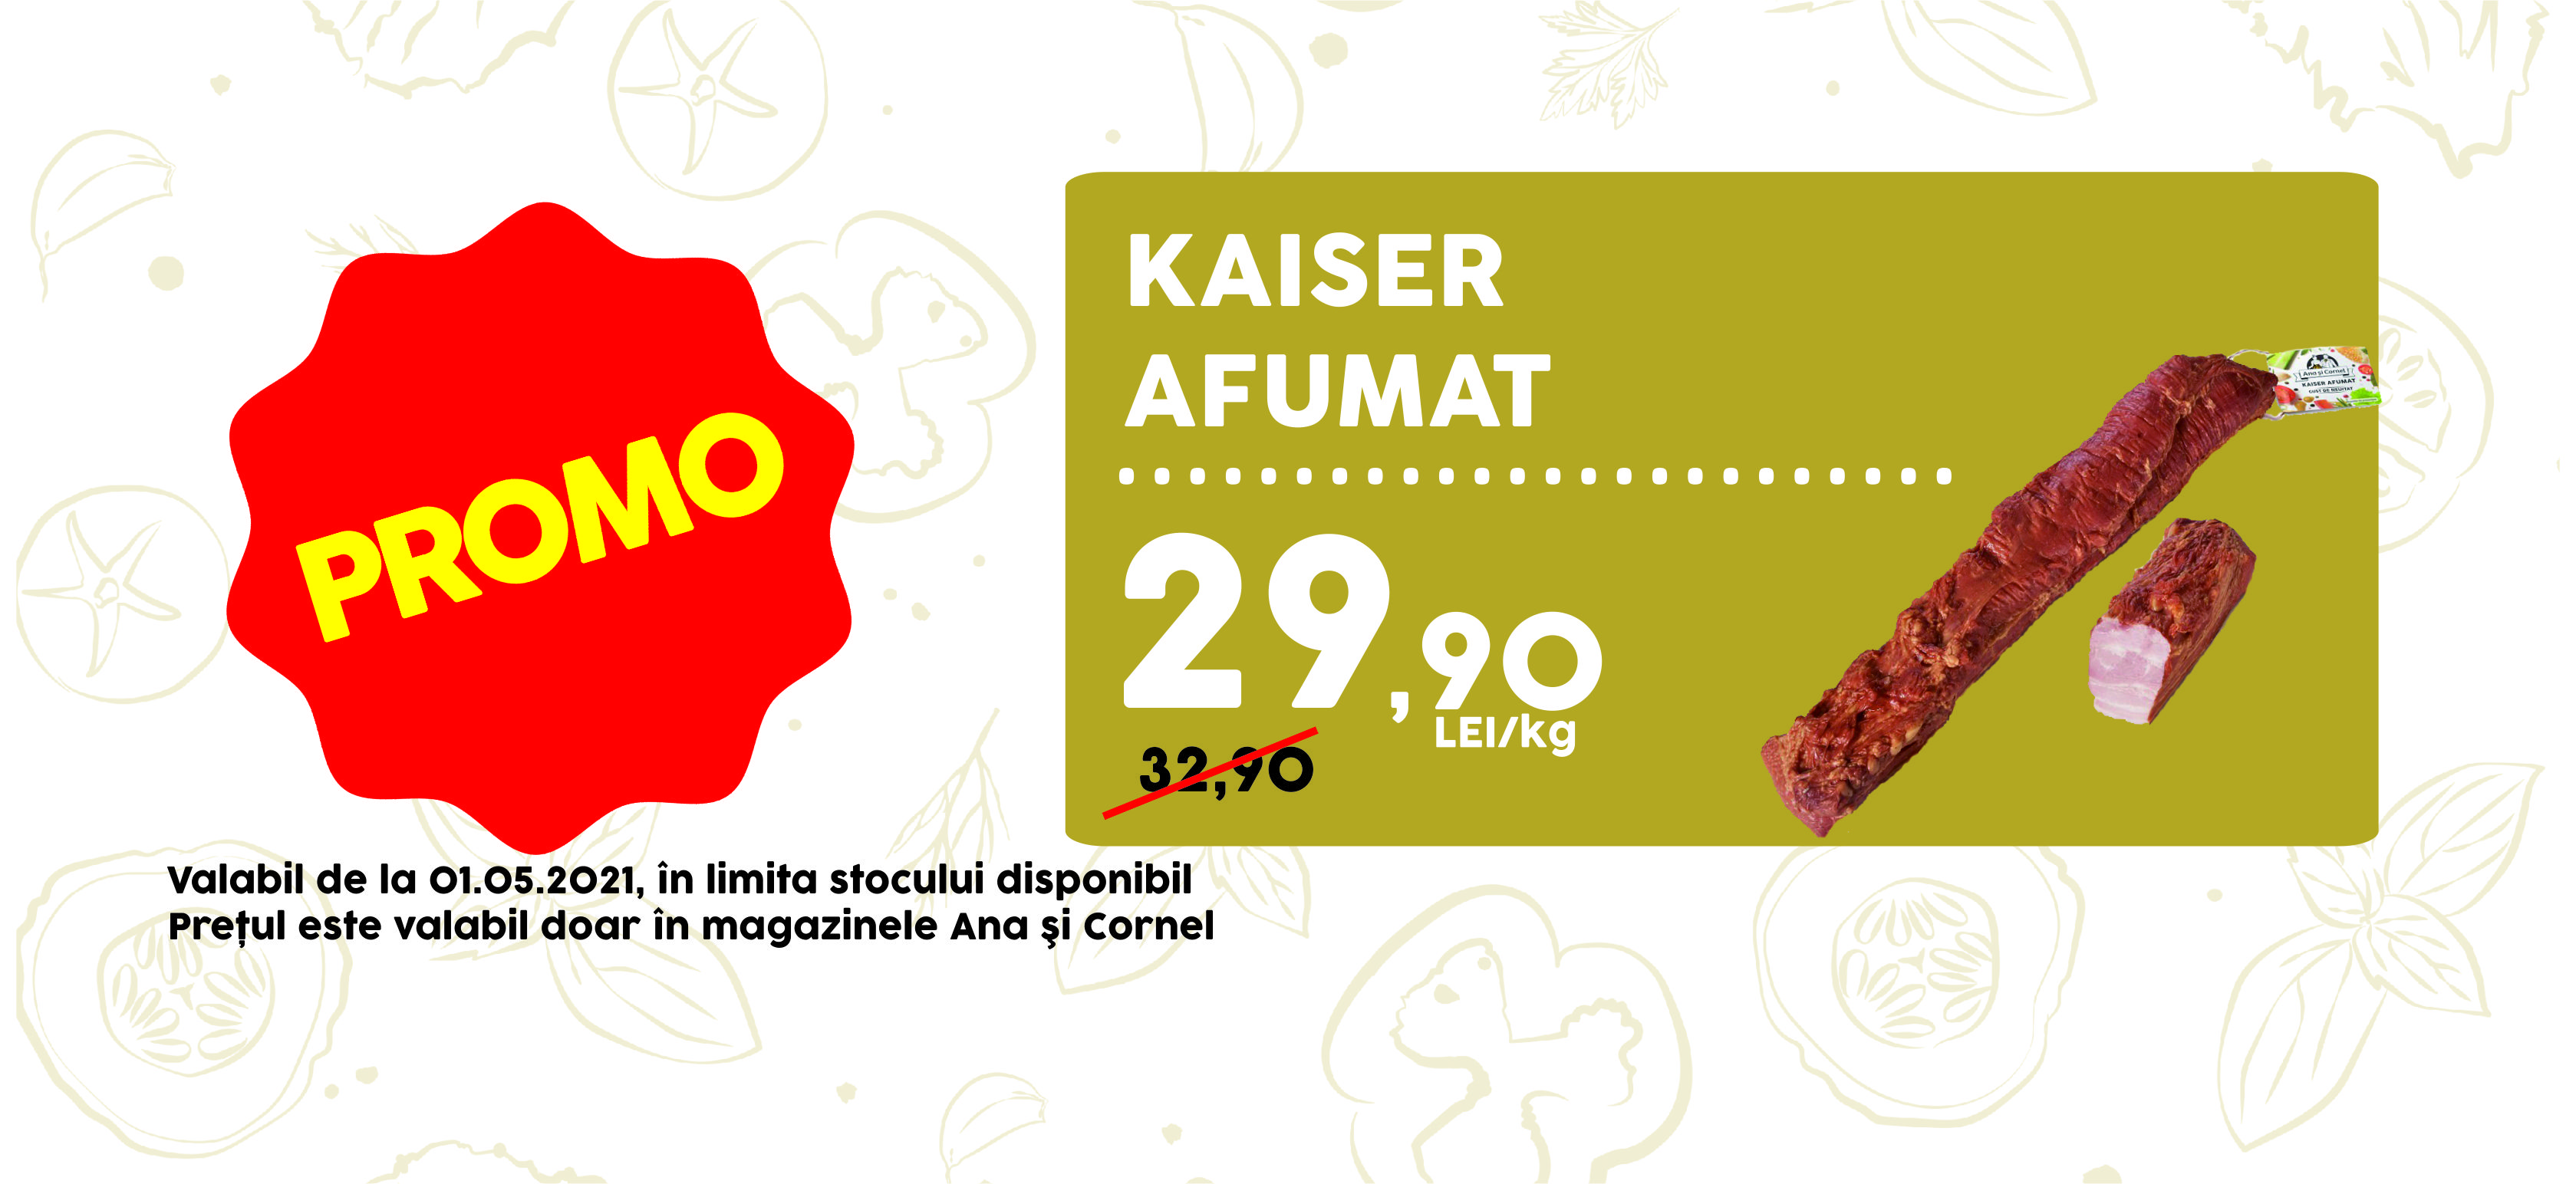 KAISER-AFUMAT-MAI